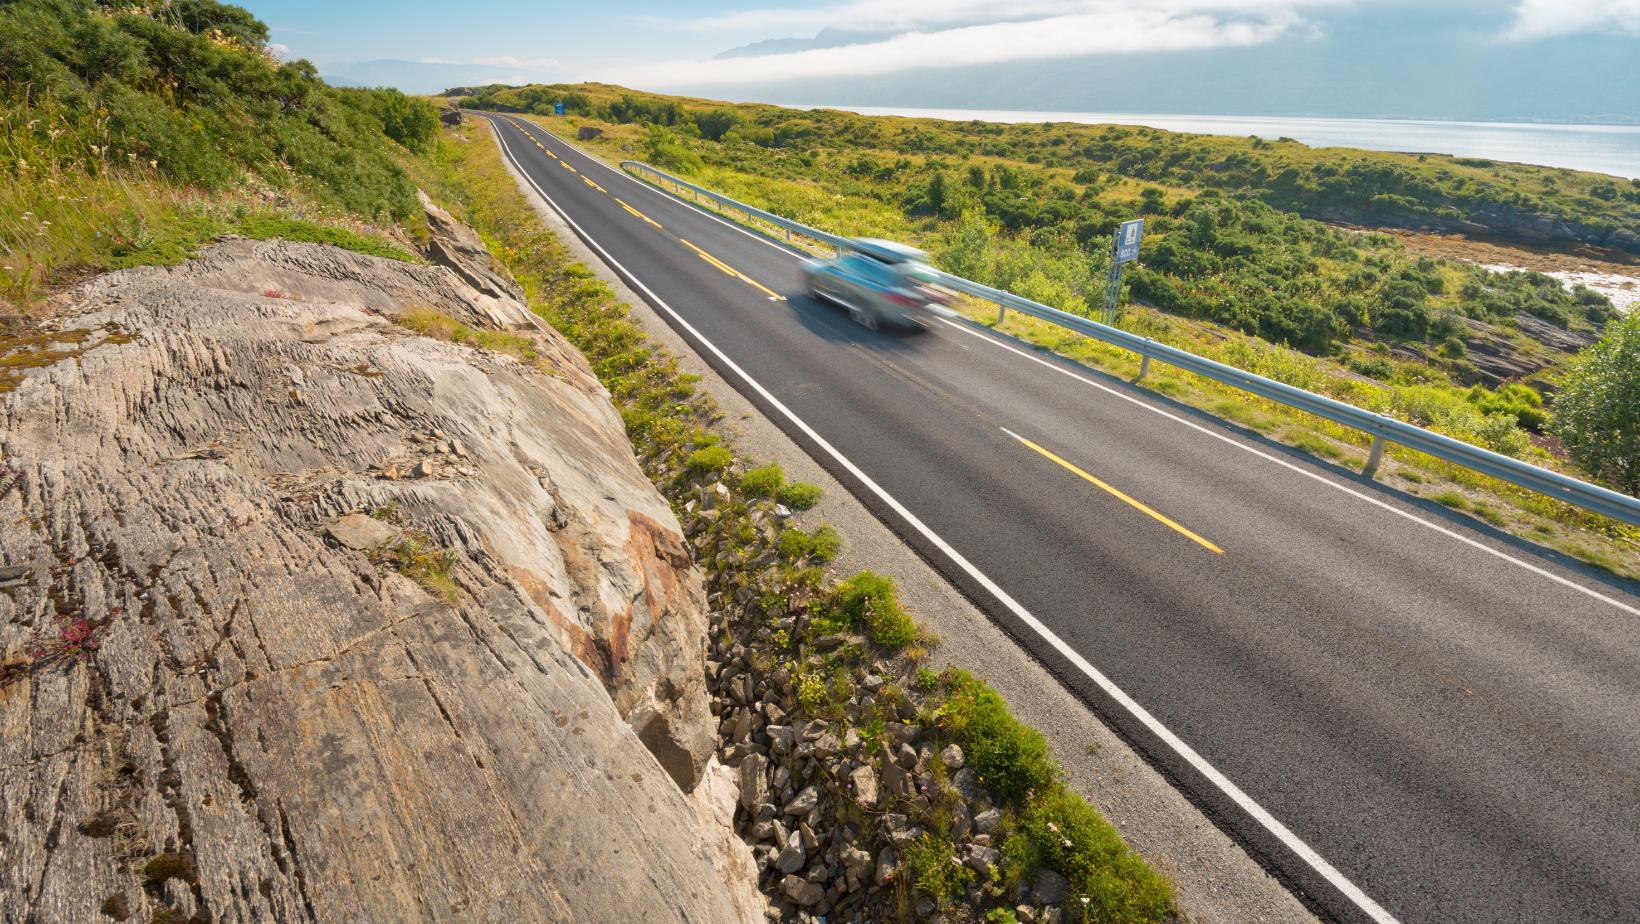 Fakta om fart